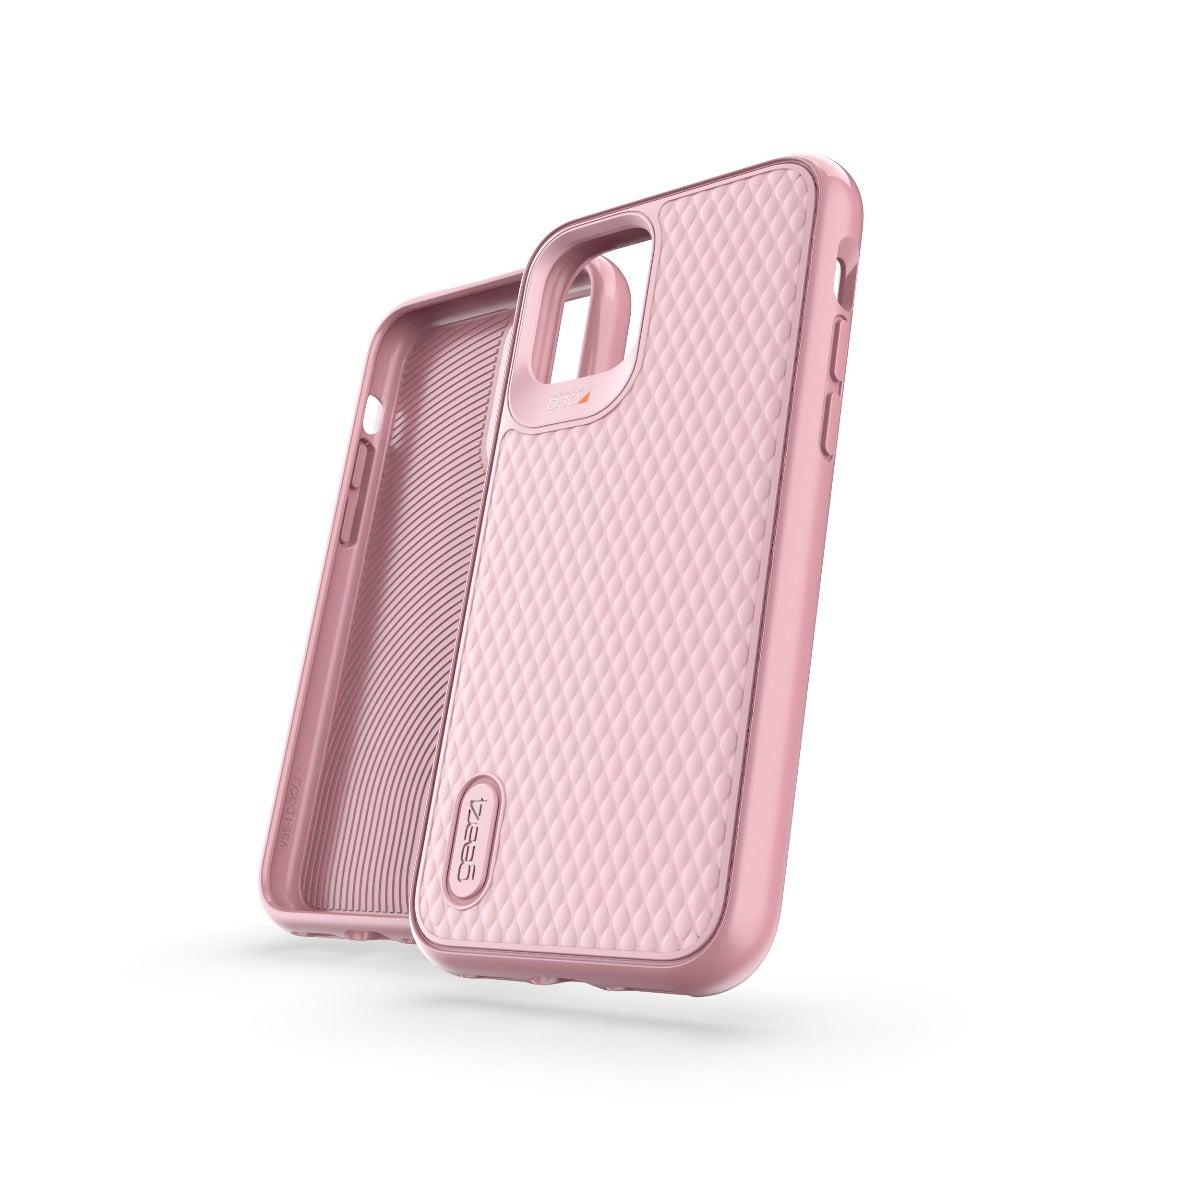 "GEAR4 Battersea funda para teléfono móvil 15,5 cm (6.1"") Rosa"